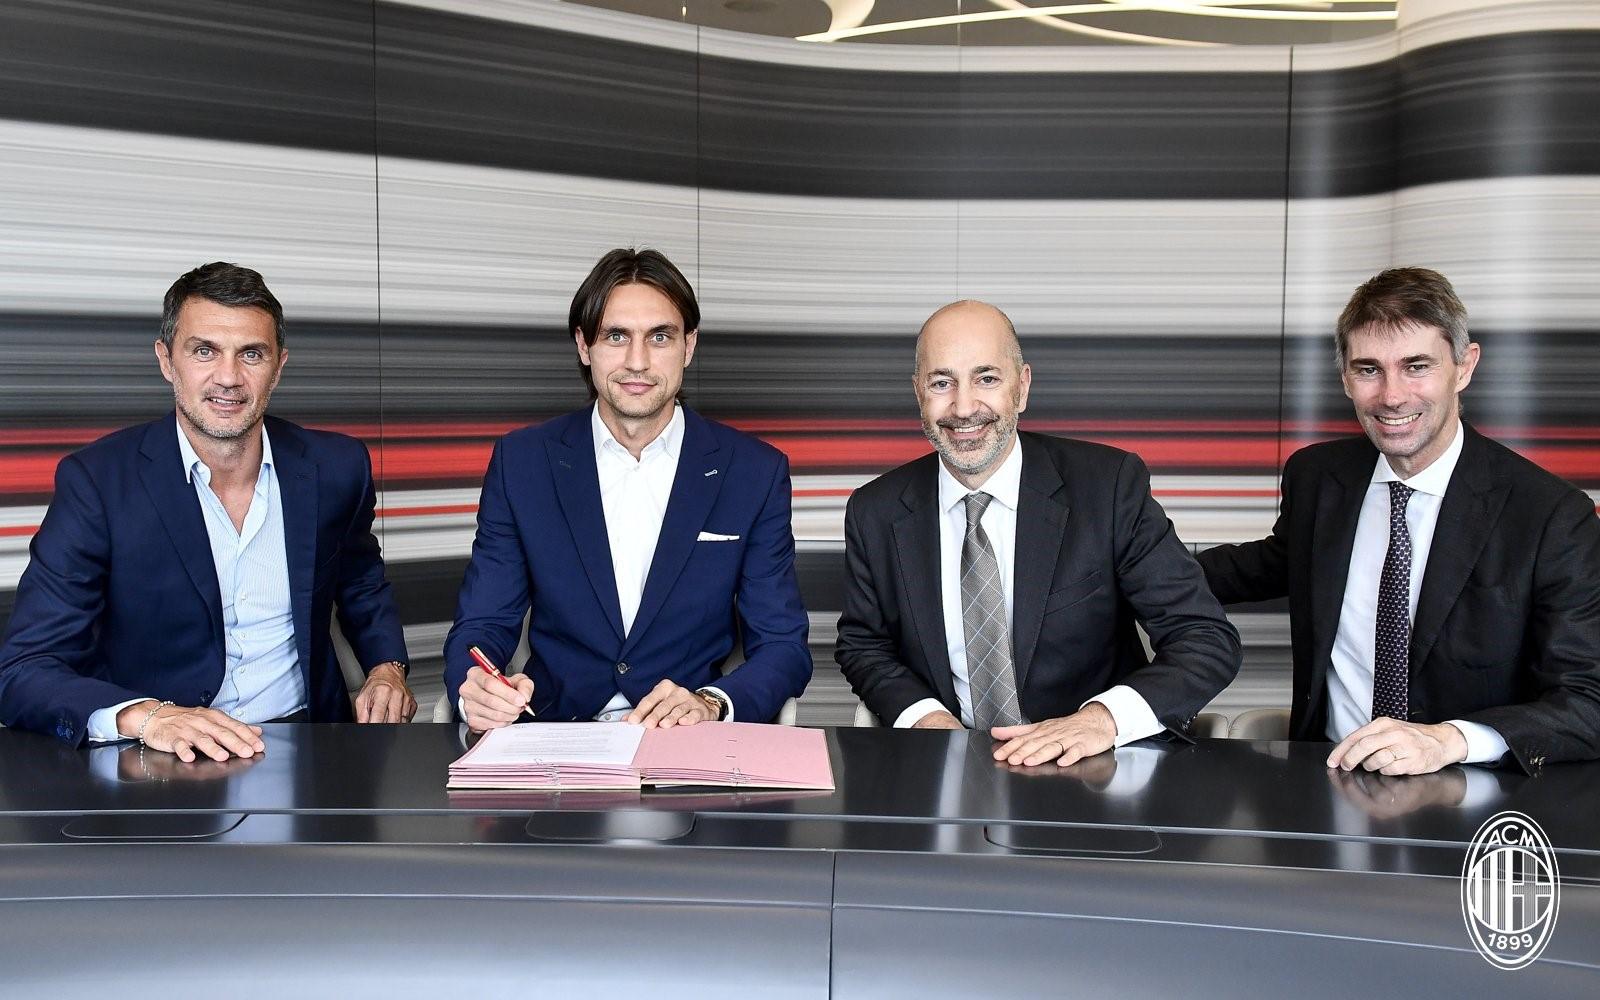 https://i.eurosport.com/2020/09/12/2885187.jpg